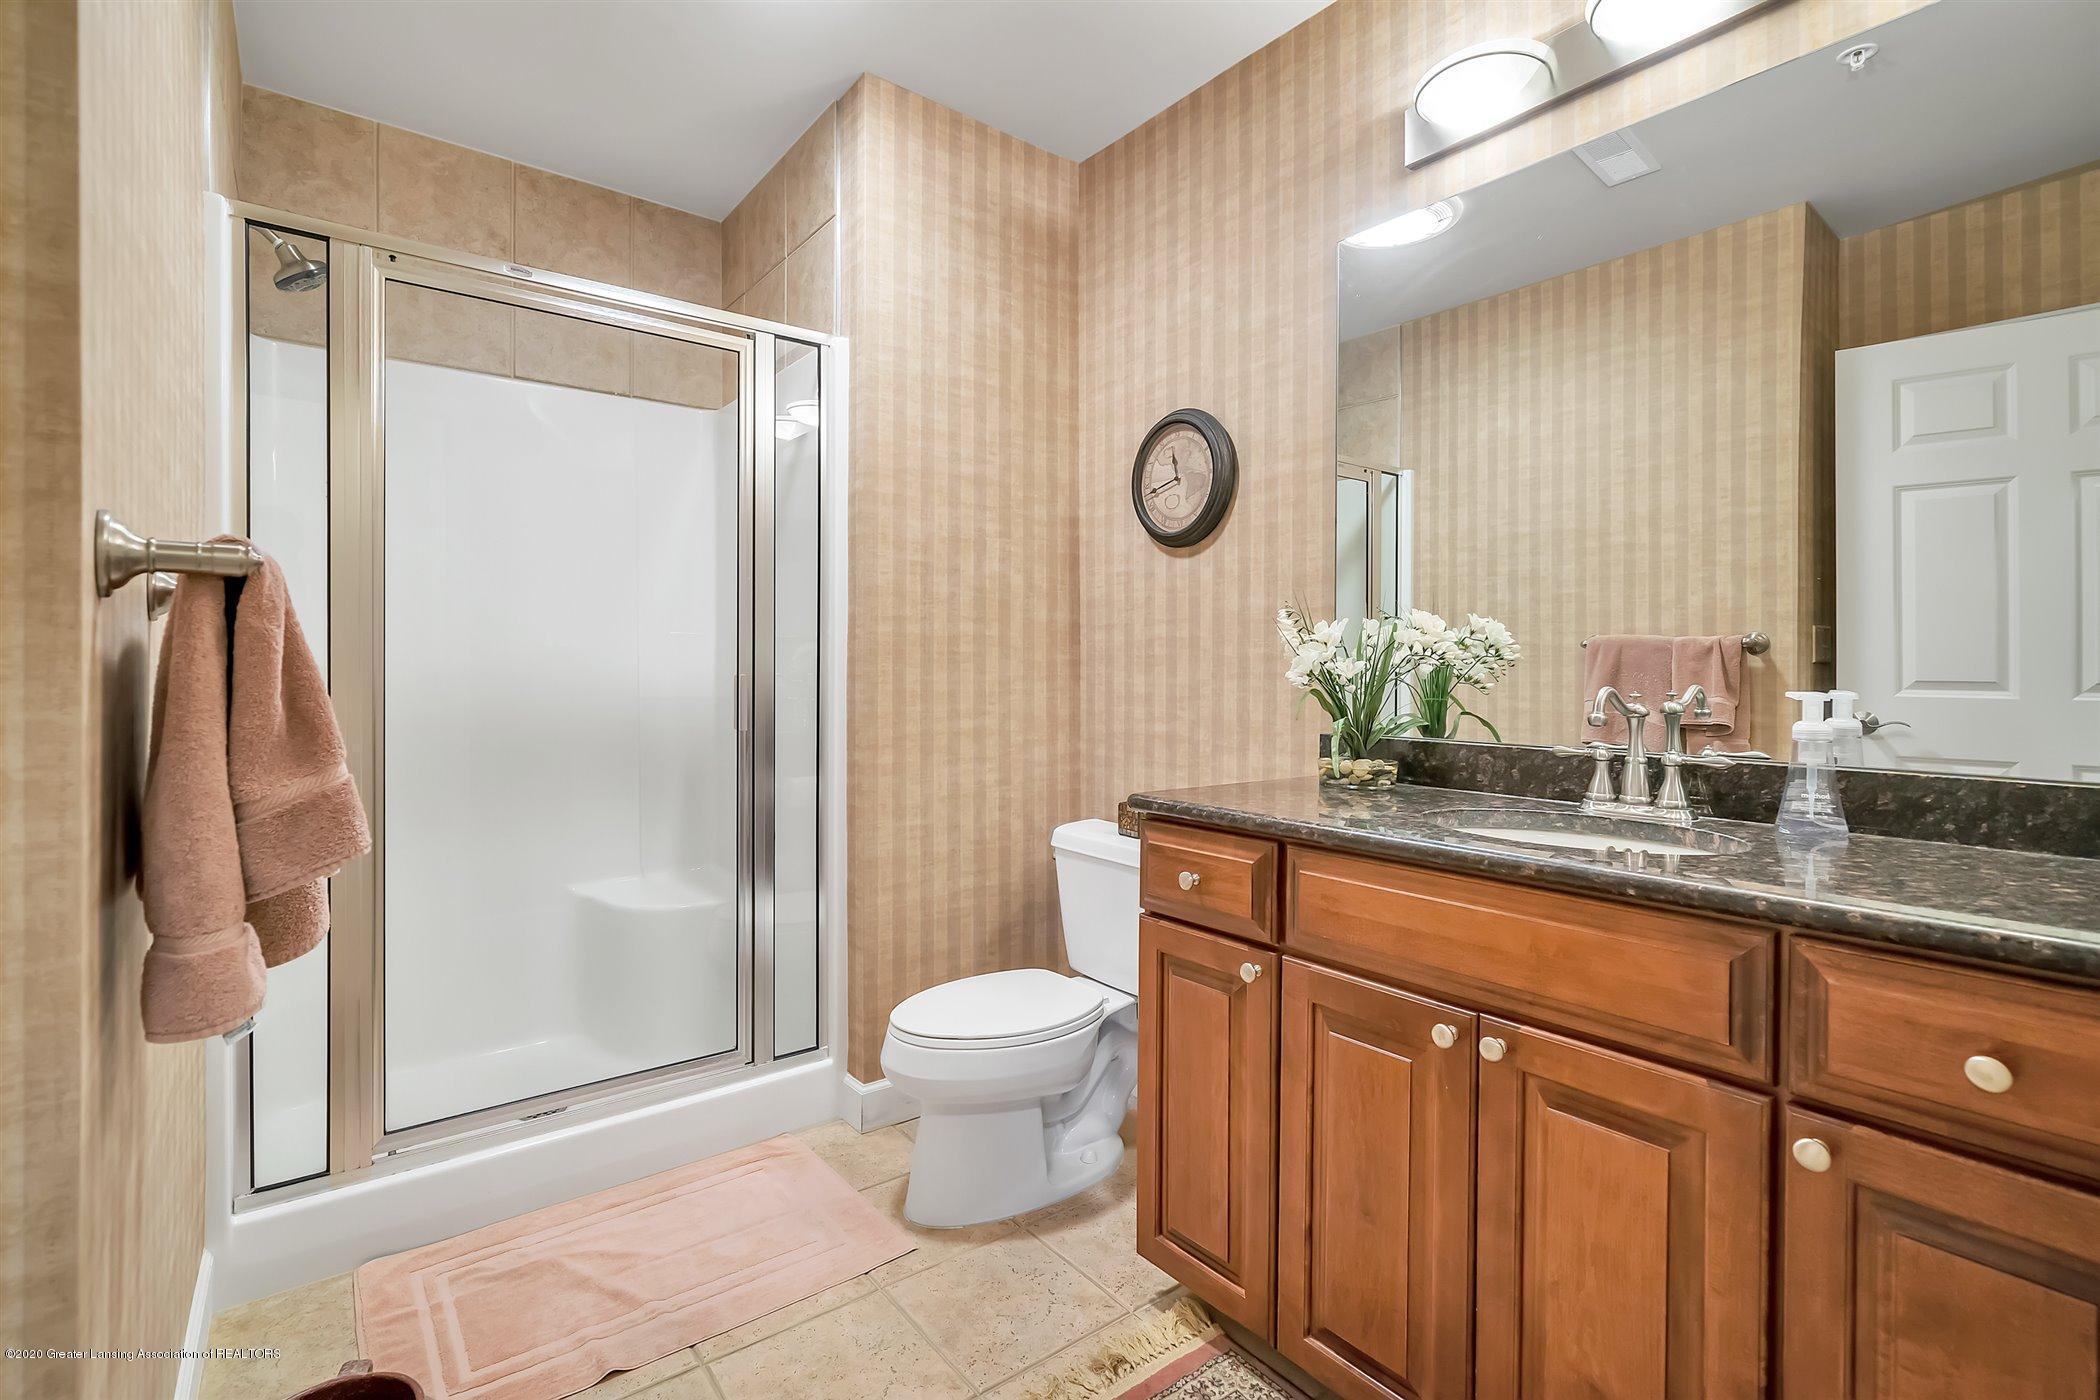 220 M. A. C. Ave Apt 409 - Full Guest Bathroom - 19